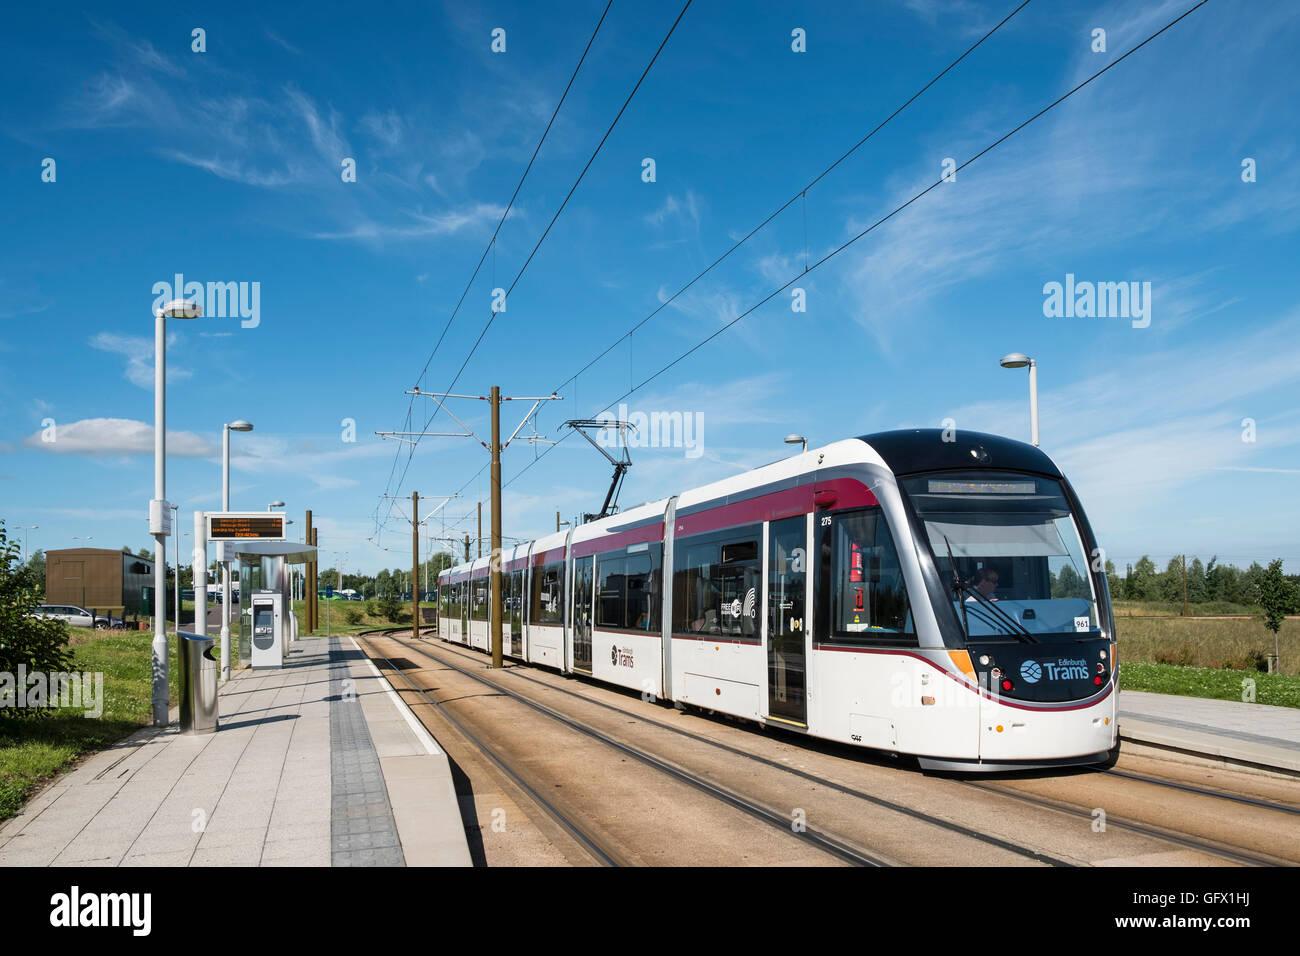 Modern tram in Edinburgh Scotland united Kingdom - Stock Image